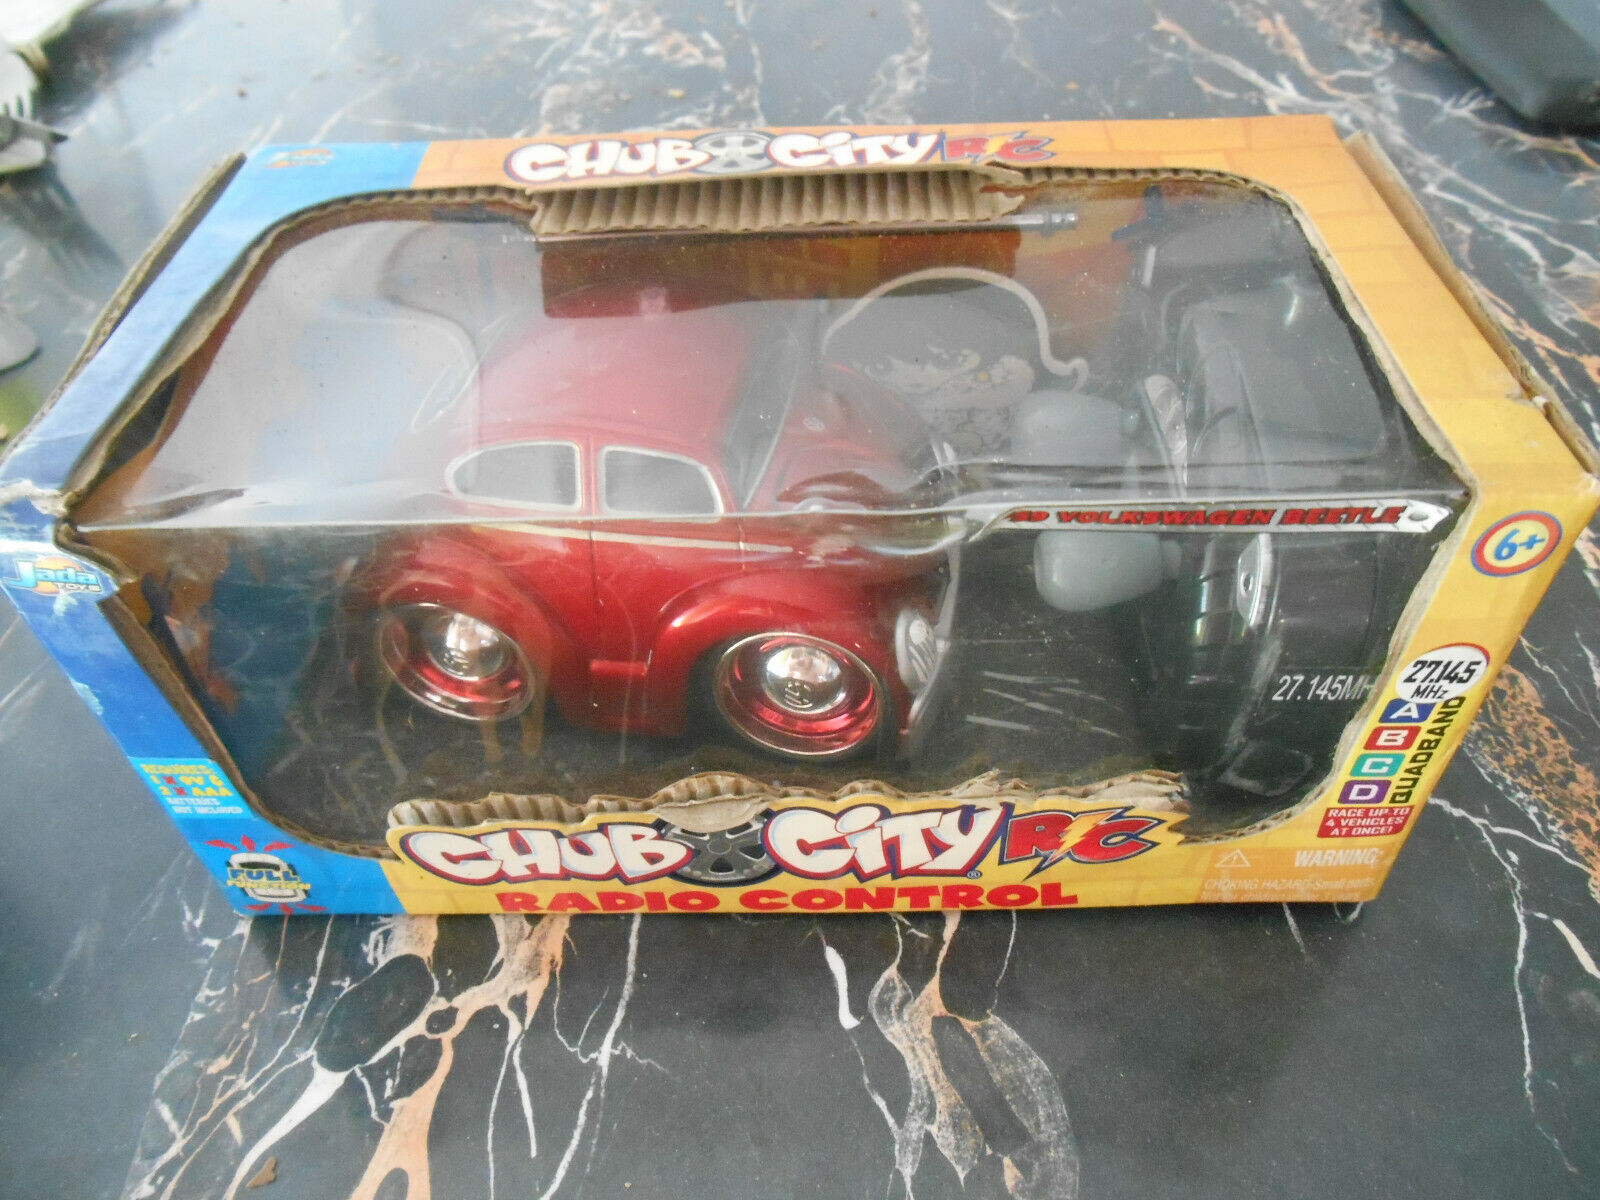 Jada Jada Jada giocattoli Chub città RC Volkswagen Beetle coccinelle telecomuomodé dd64be